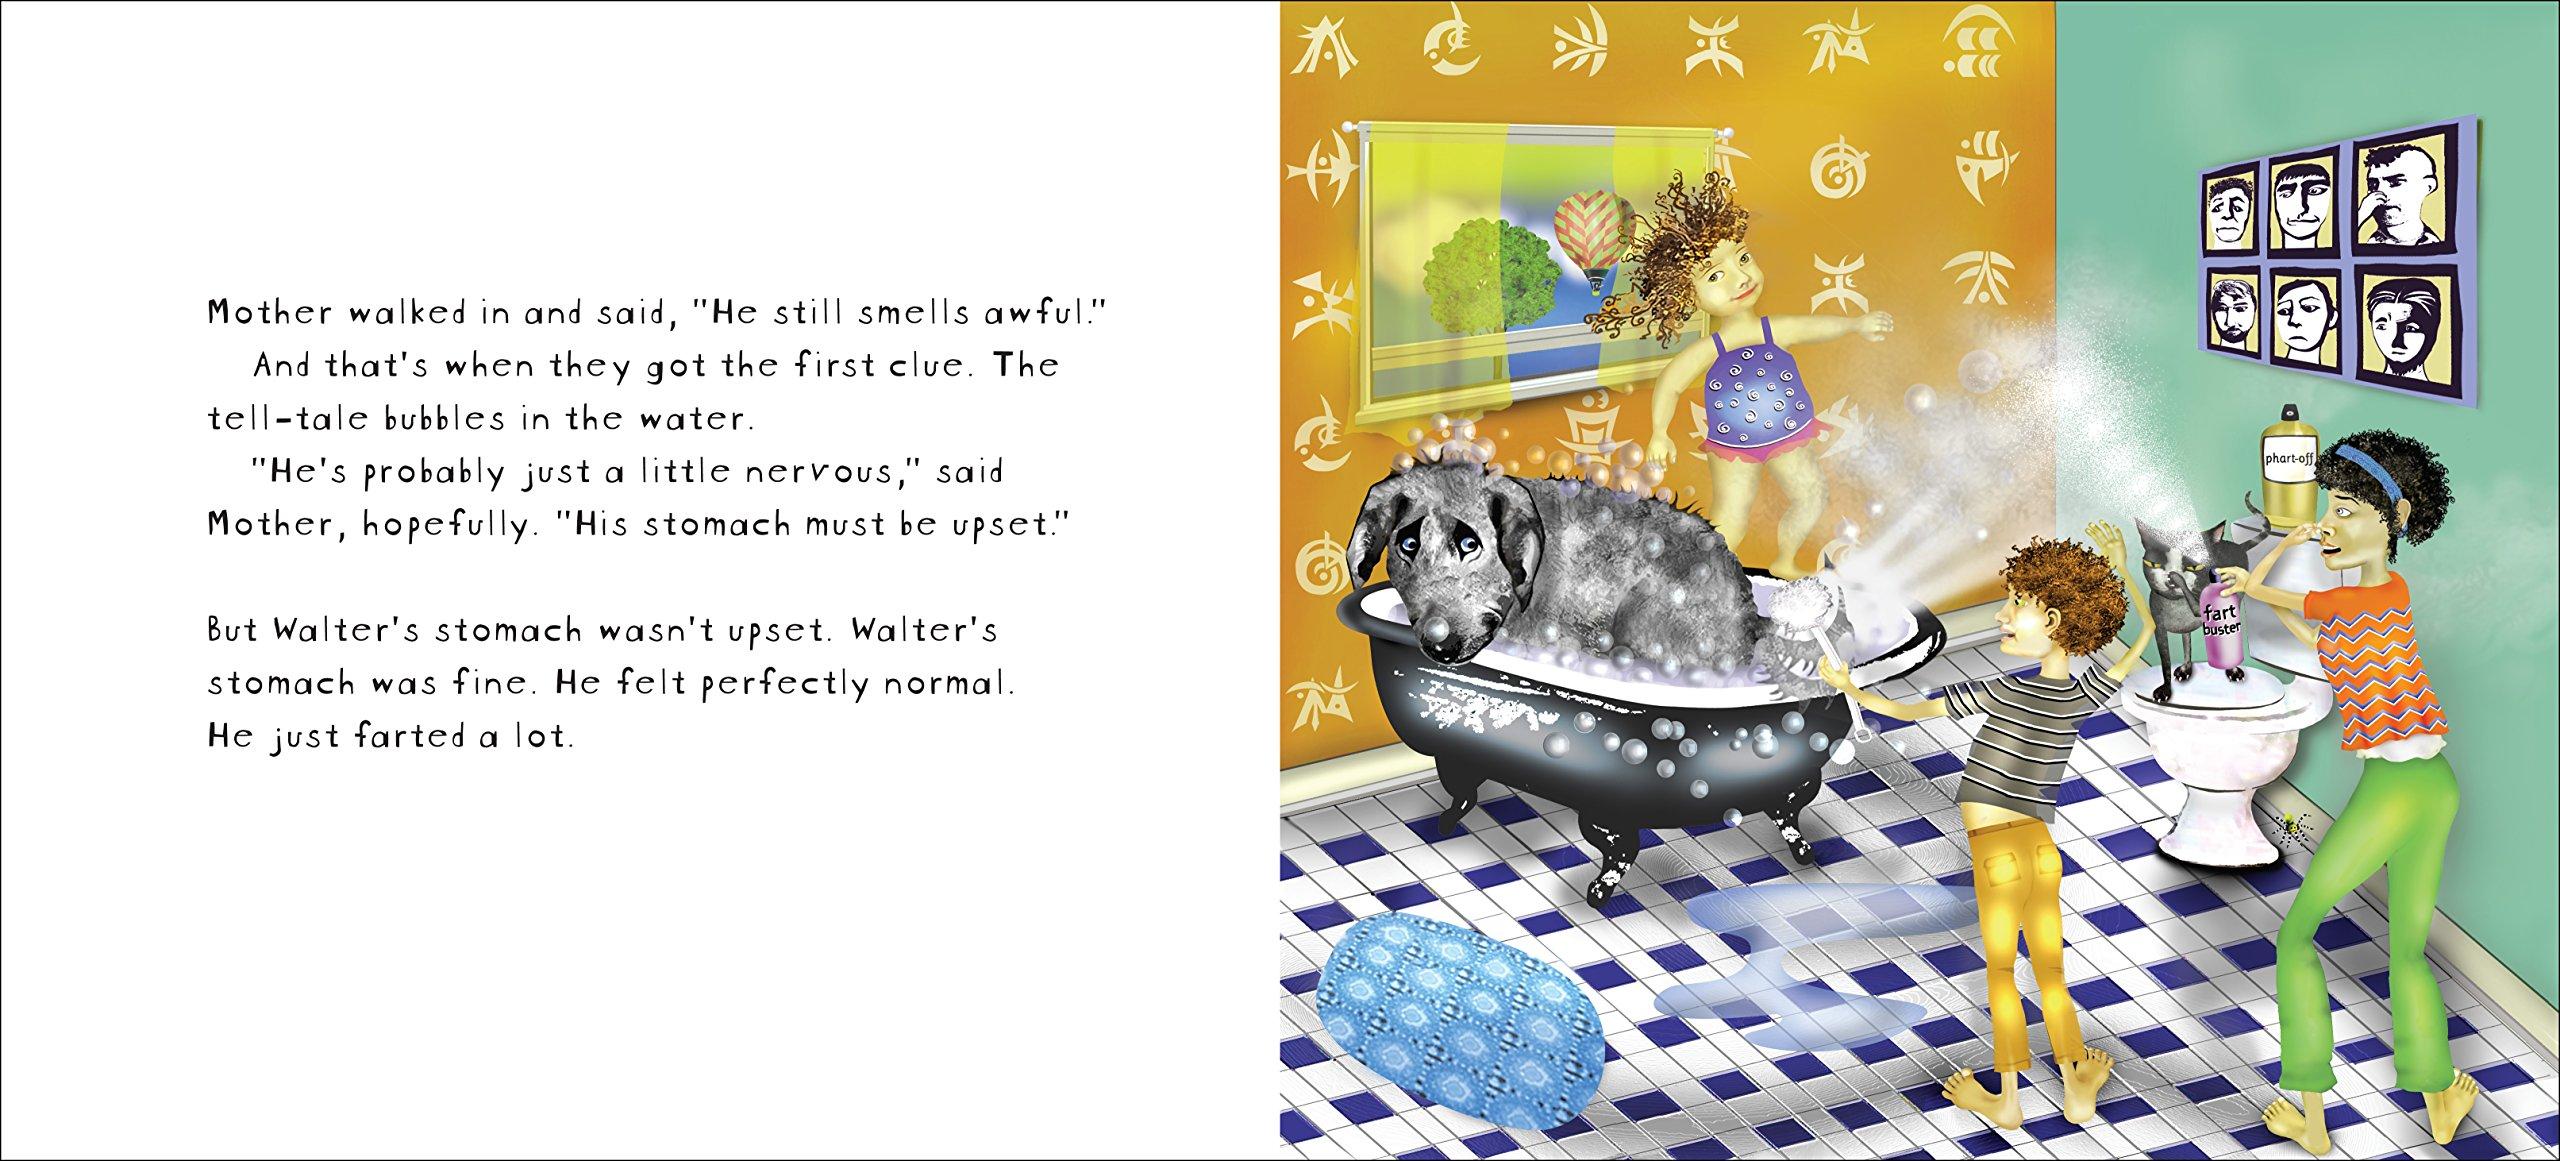 Walter the Farting Dog: Amazon de: William Kotzwinkle, Glenn